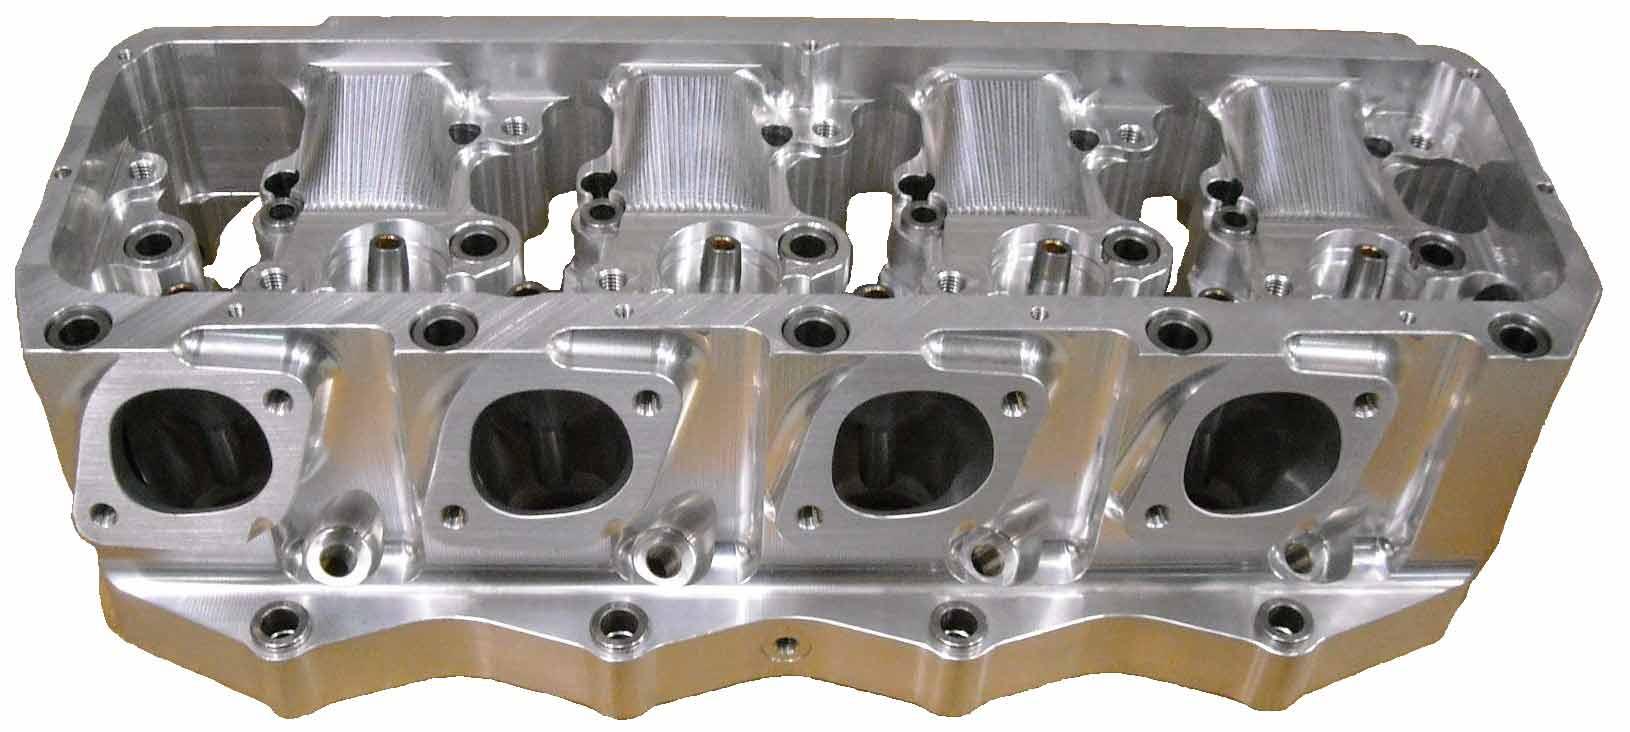 481-X Stage I Cylinder Heads